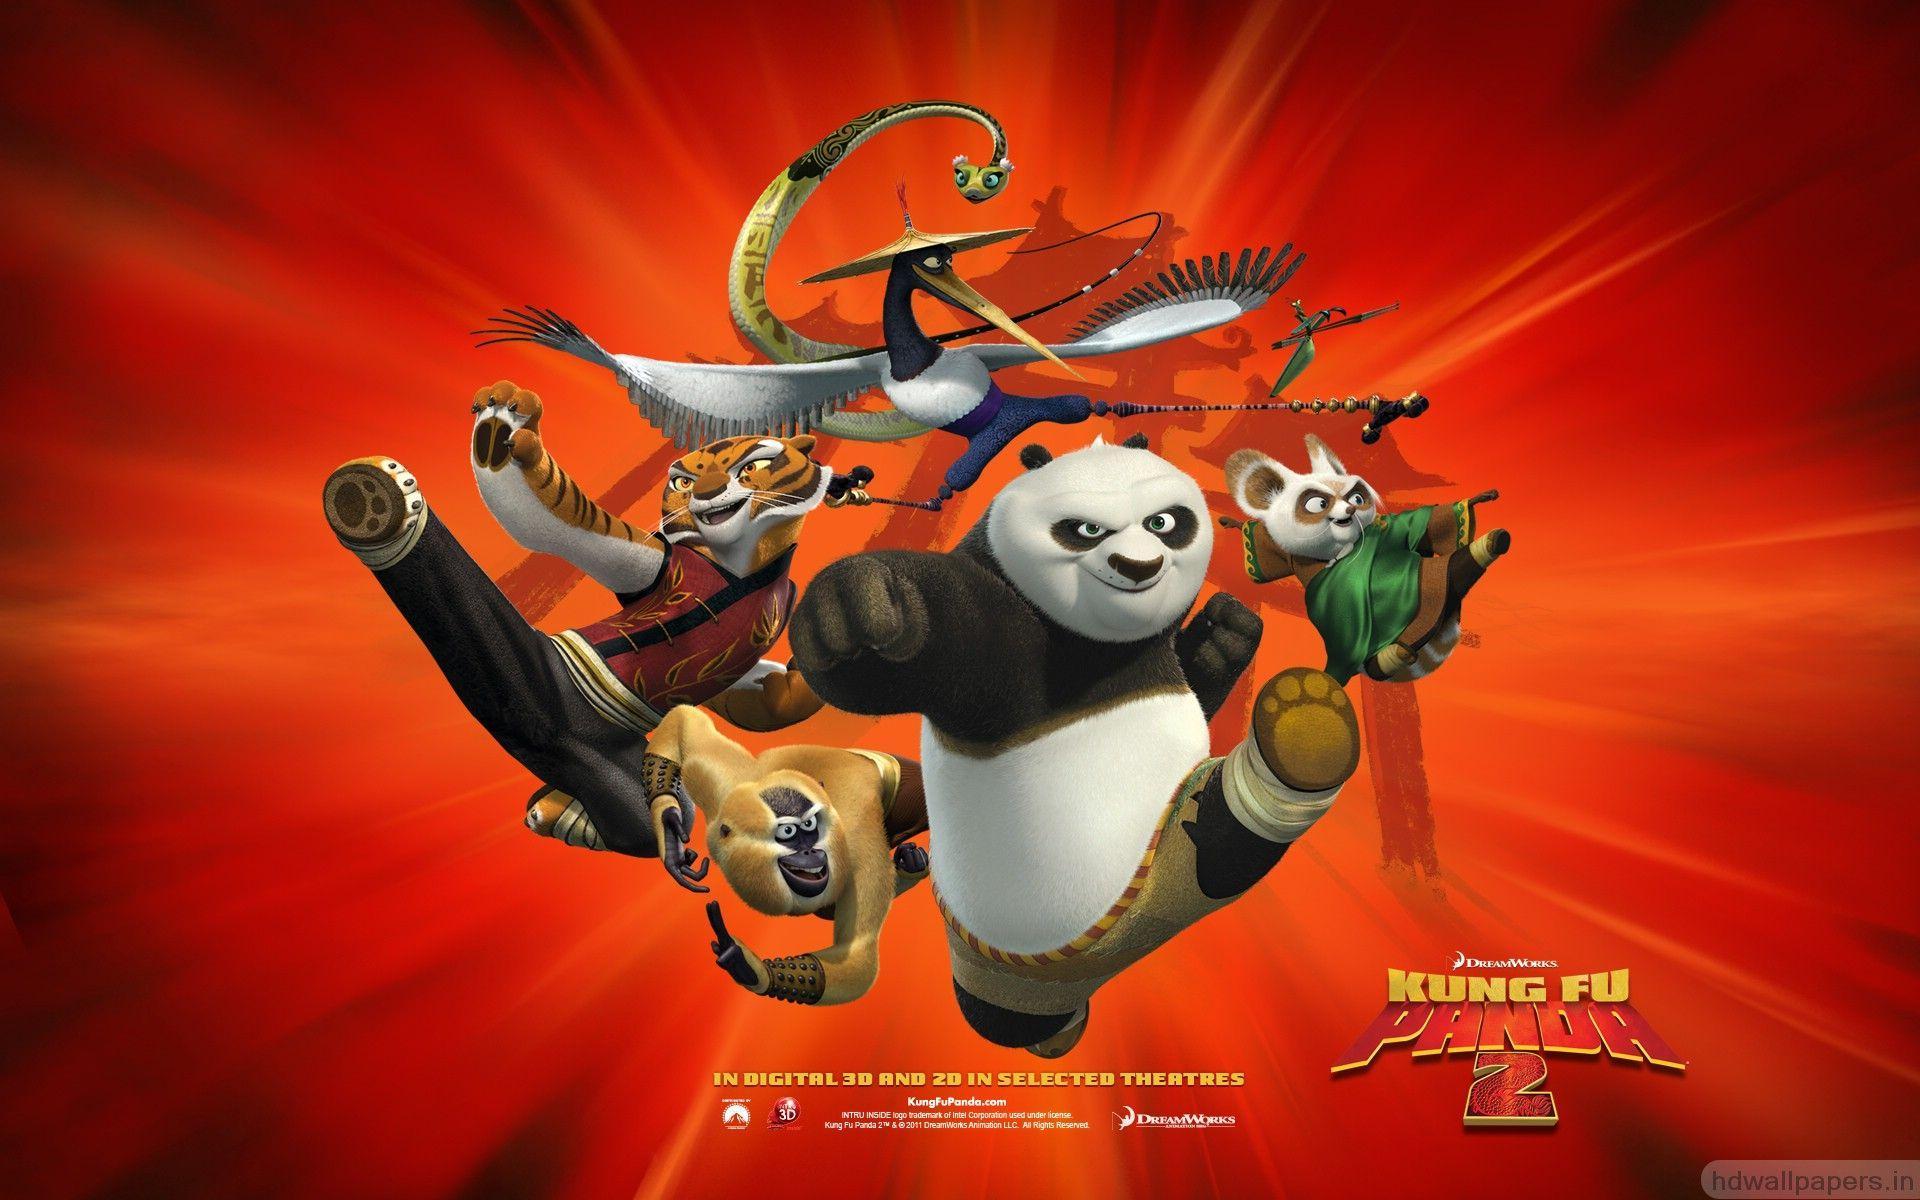 Kung Fu Panda 2 Wallpapers Hd Wallpaper Cave